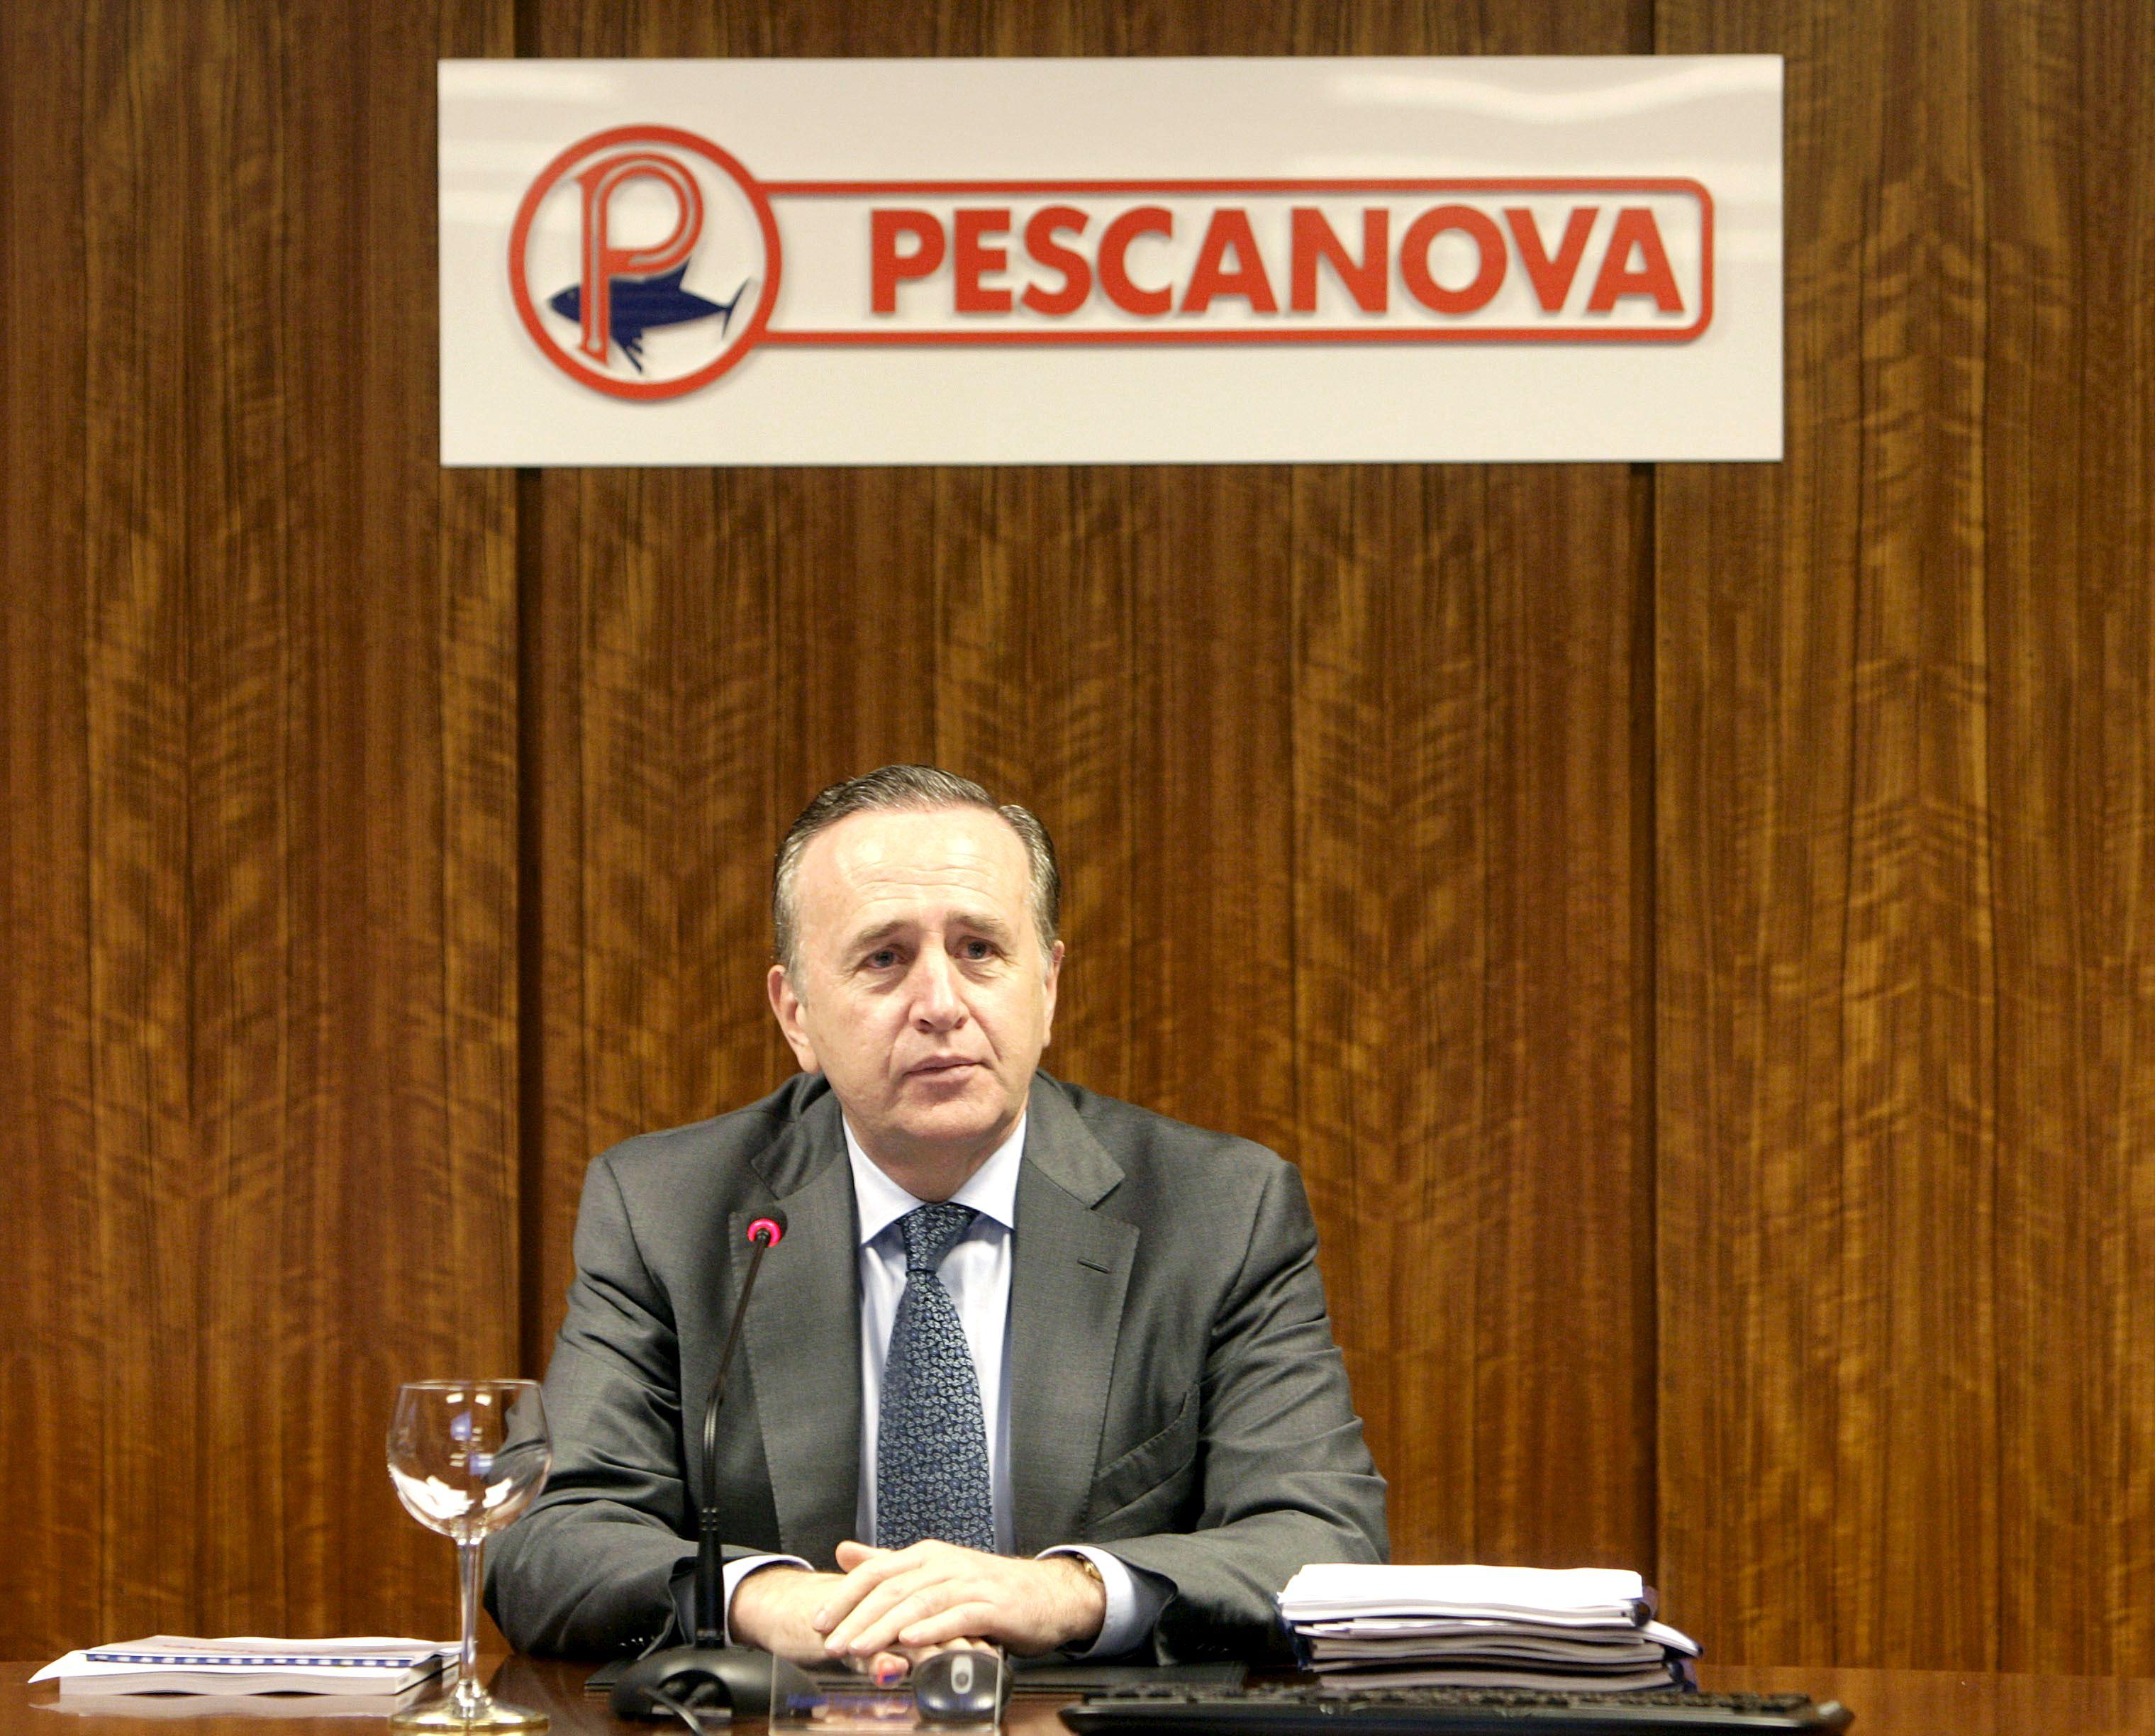 Blanqueo de Capitales pide a Hacienda un informe de 20 empresas de la familia Sousa